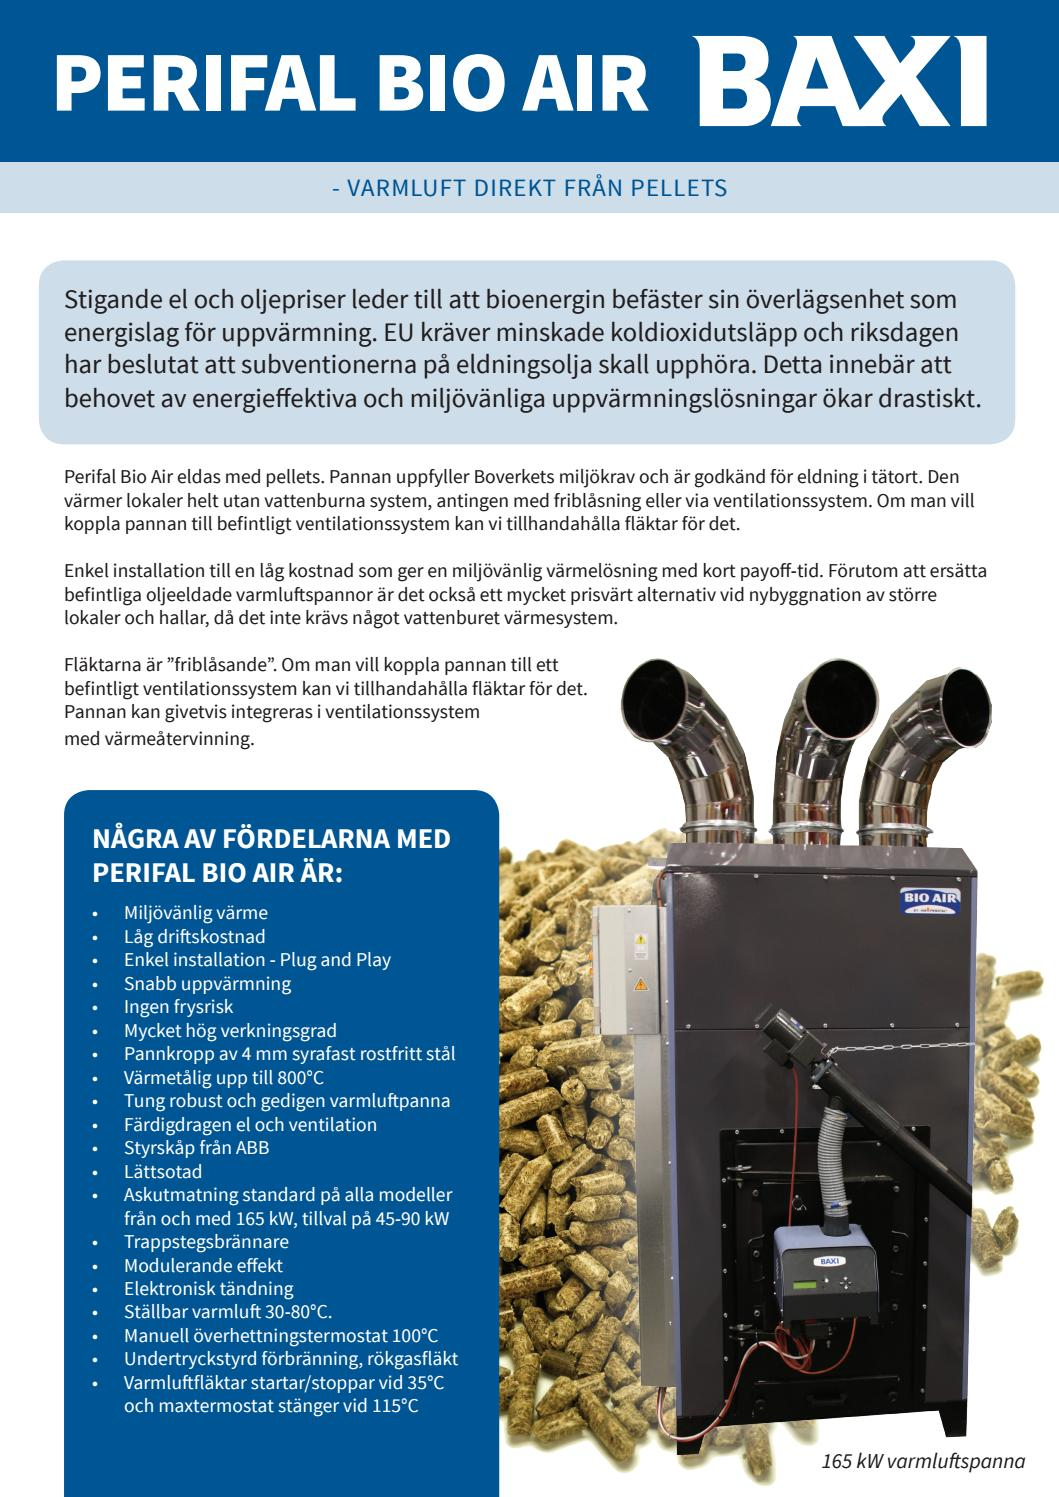 Inredning pellets kostnad : BAXI/HS Perifal - Produktblad Bio Air by Baxi Sverige - issuu